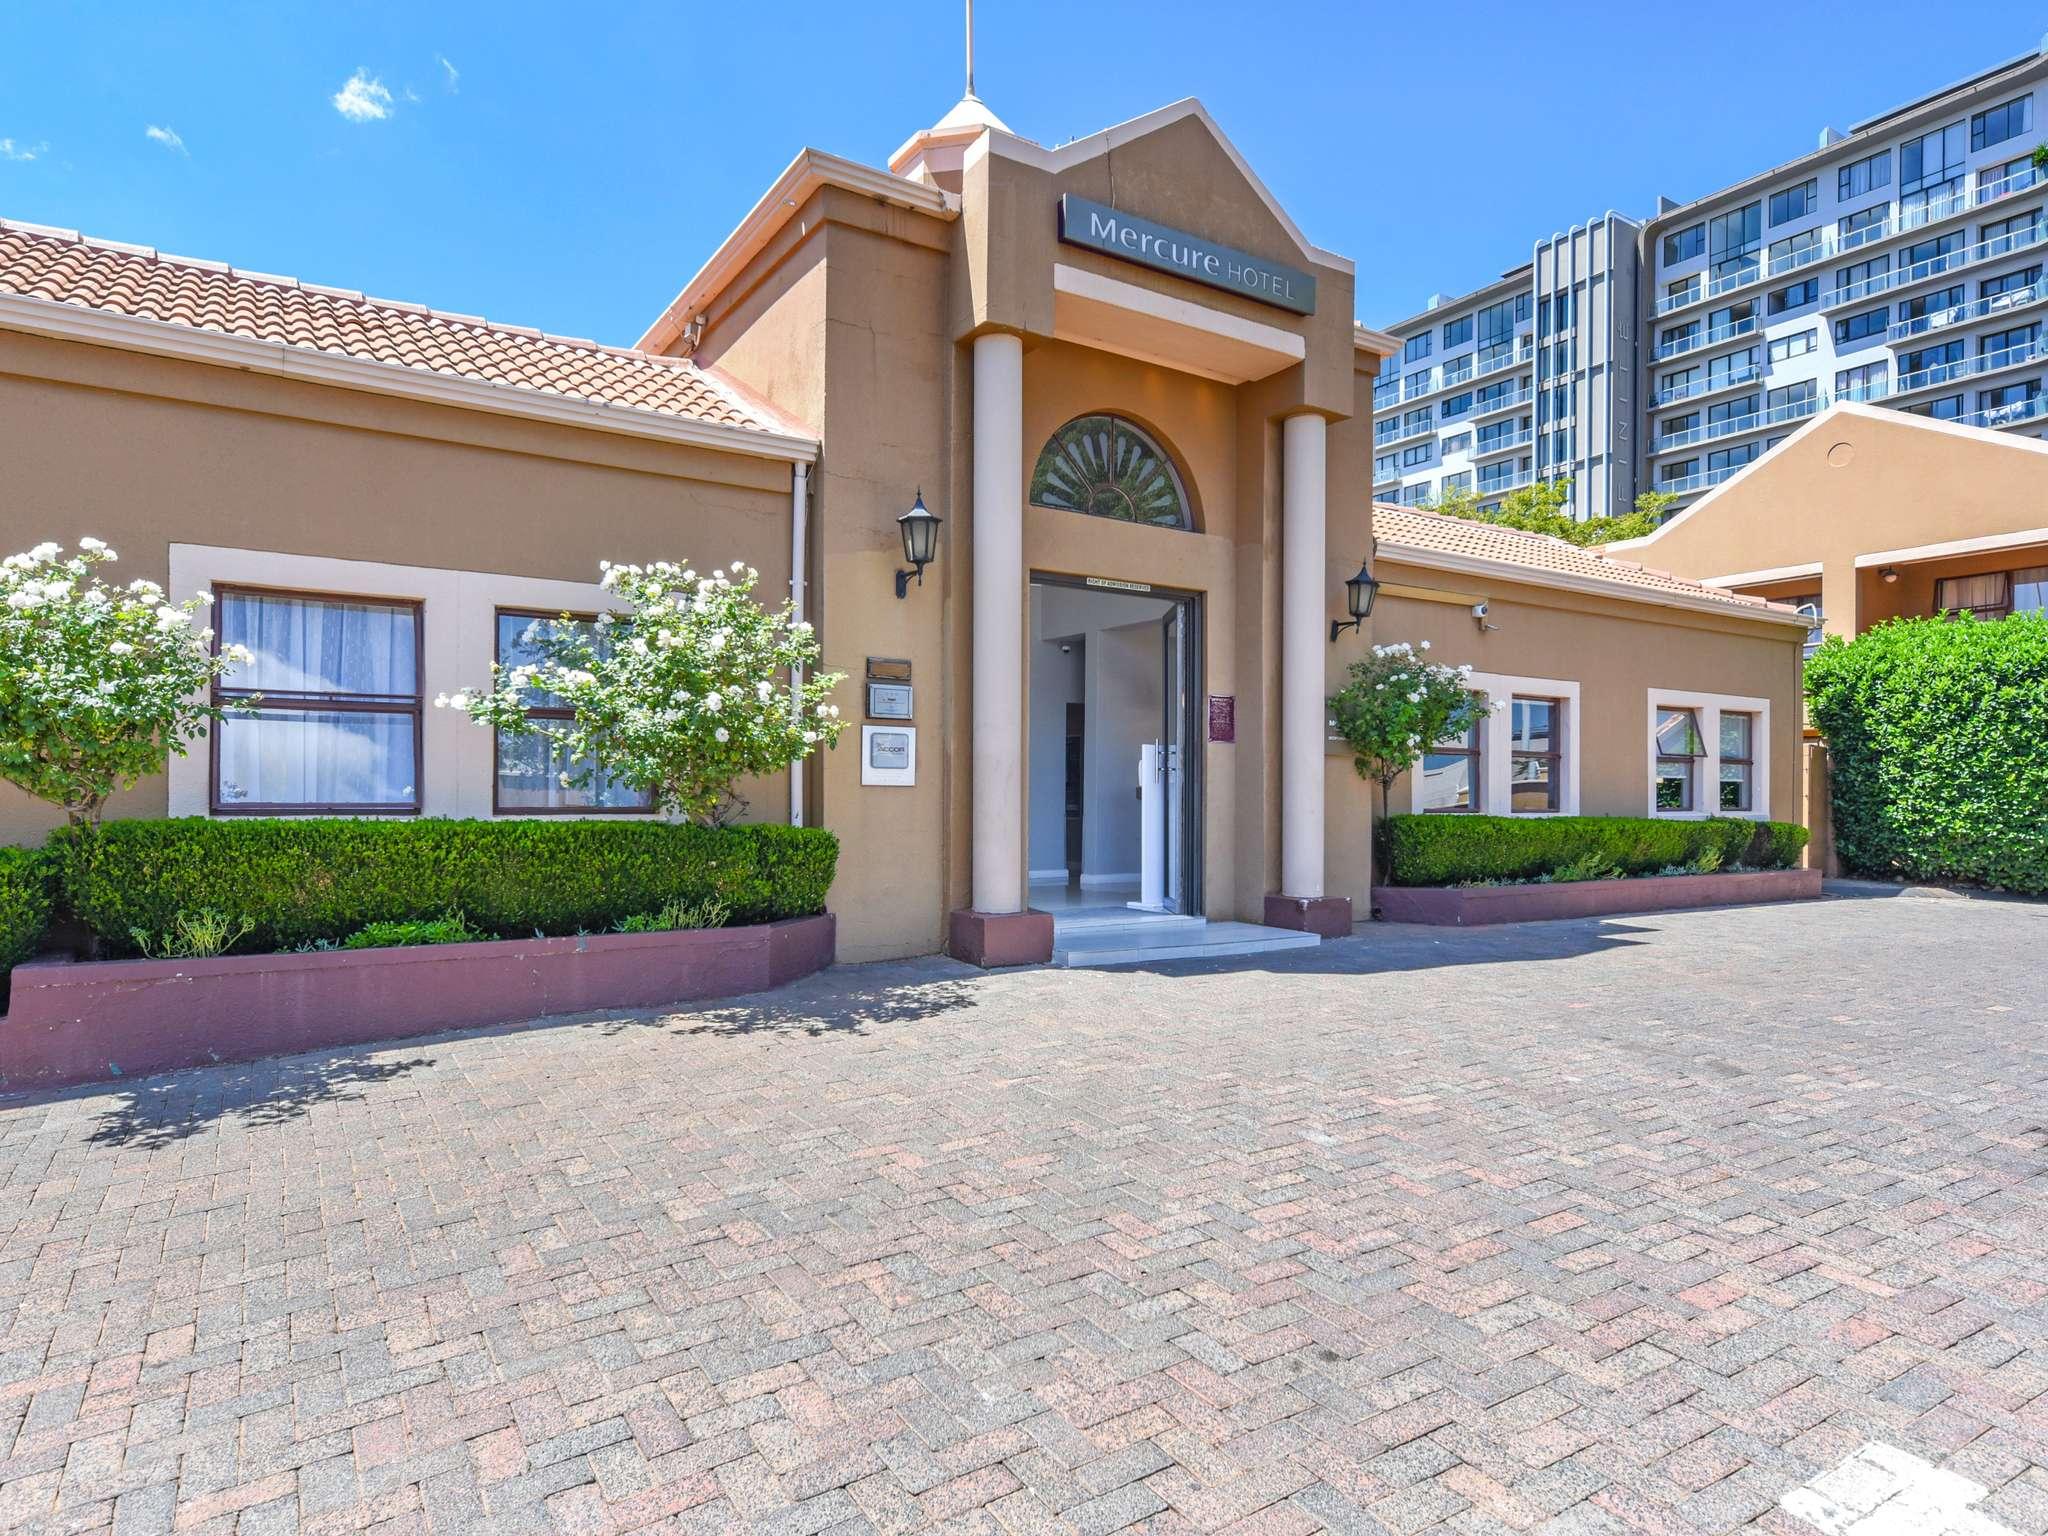 فندق - Mercure Johannesburg Bedfordview Hotel